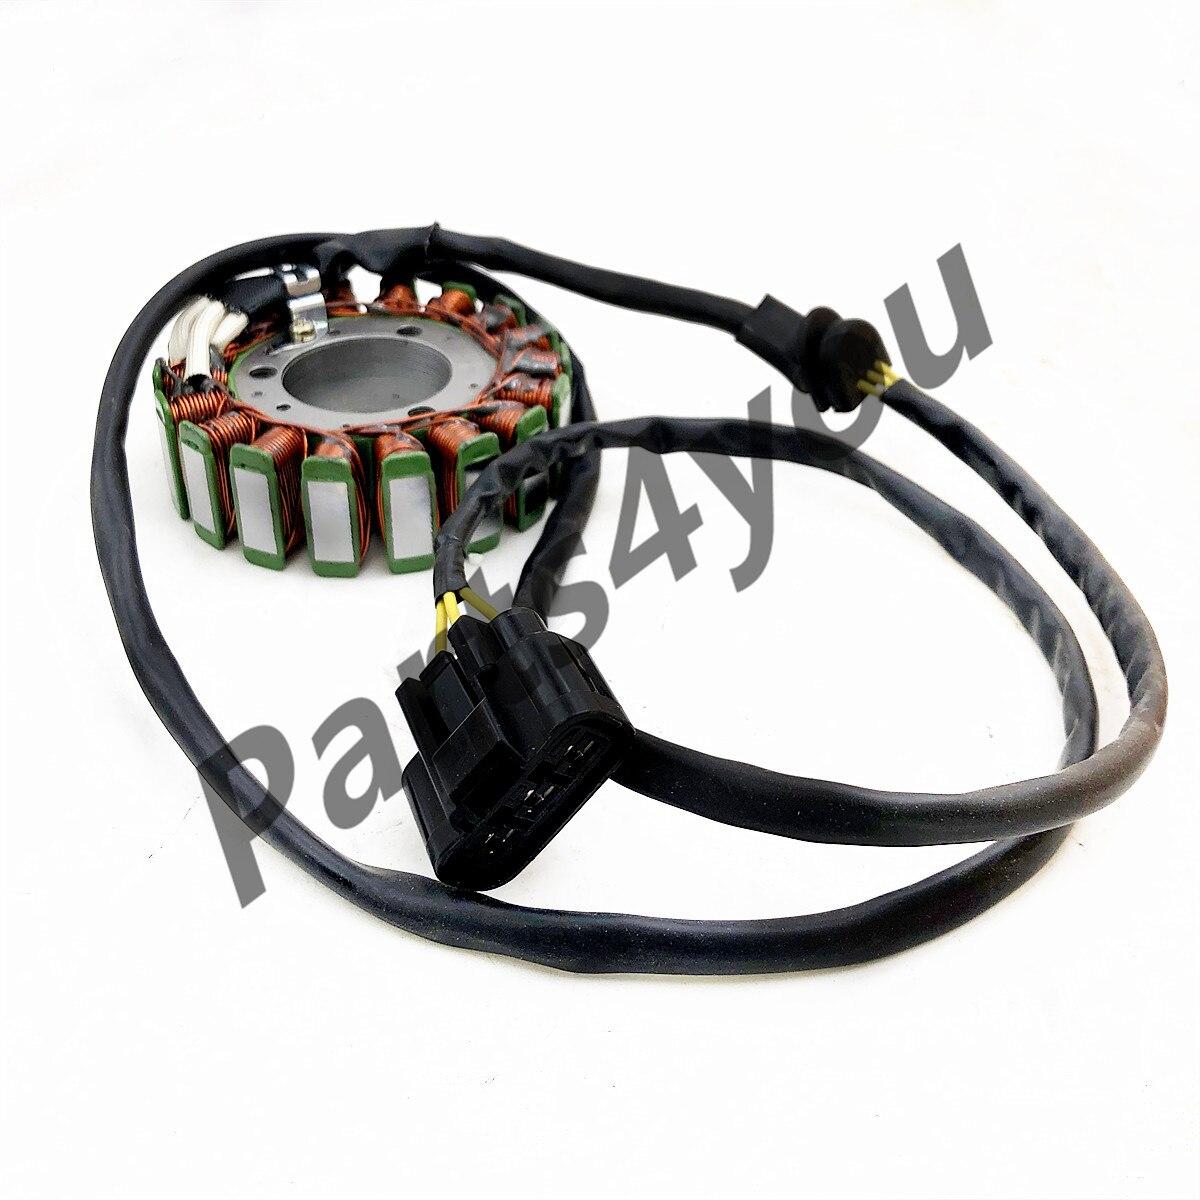 ODES LIANGZI LZ UTV 800 DOMINATOR STELS 800V RM PM Stator Starter Generator Magneto SIDE BY SIDE 21040109701 370101-001-0000 enlarge